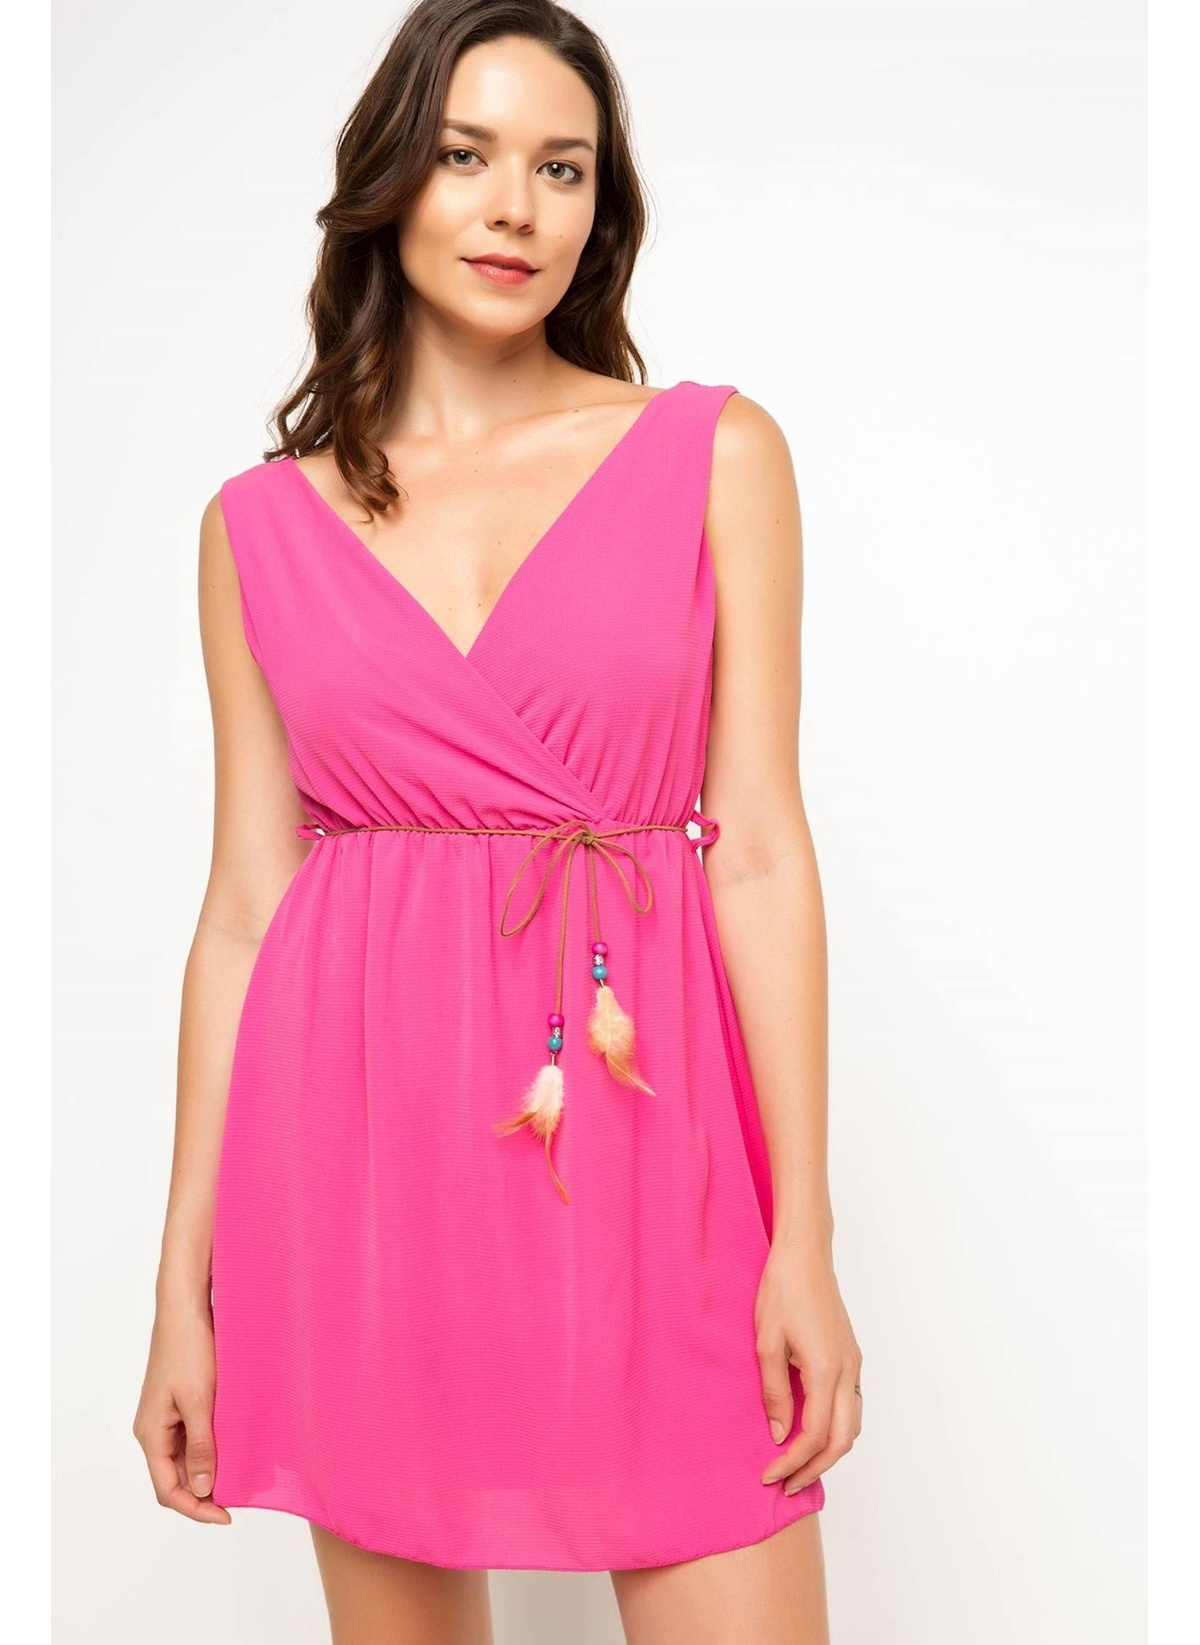 443c88fc84fd0 DeFacto Kadın Belden Kemerli Elbise Pembe | Morhipo | 22894508